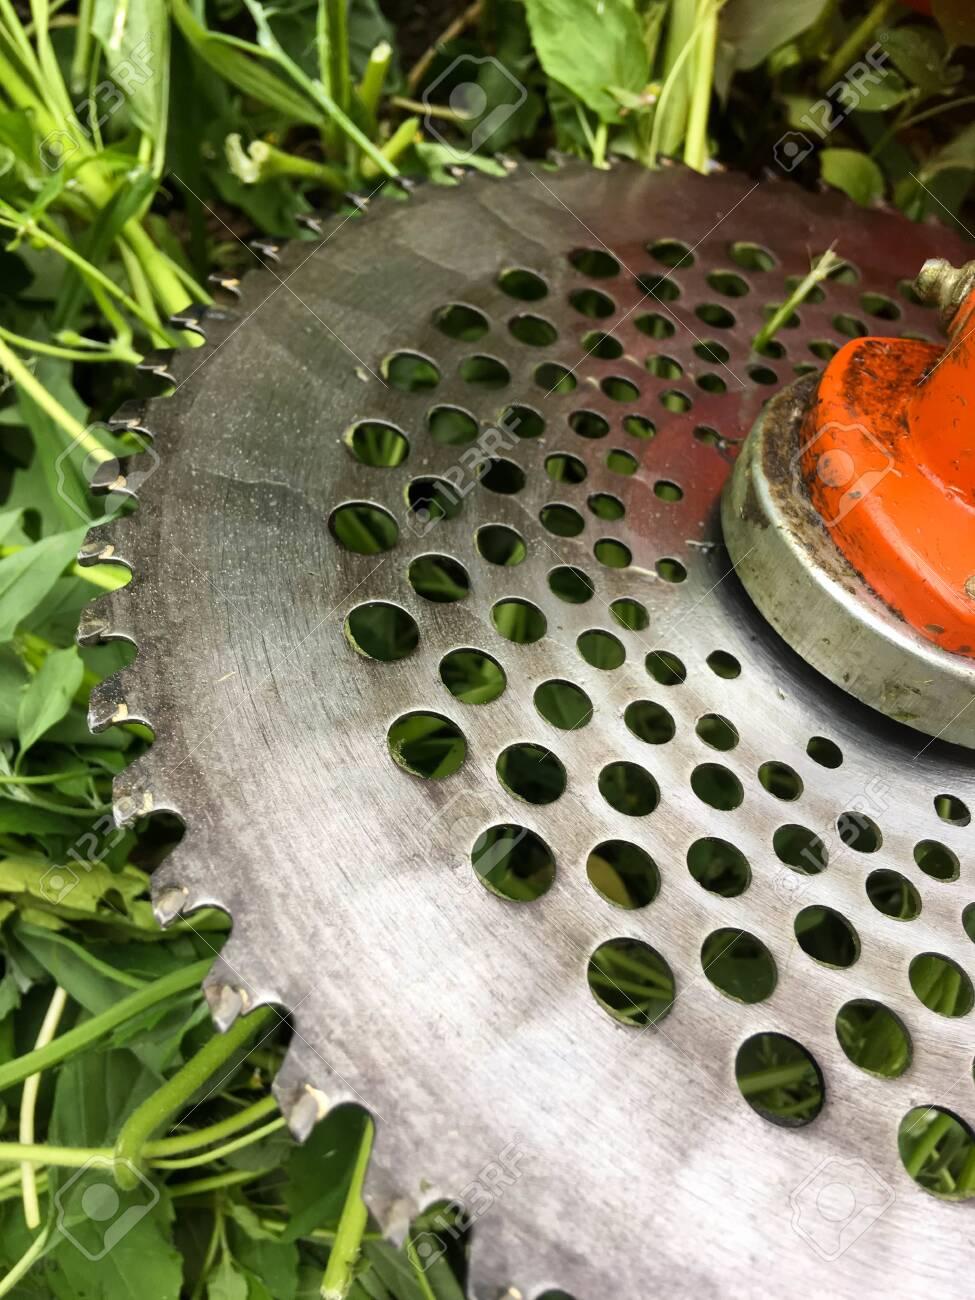 Lawn mower, grass, equipment, mow gardener care work tool - 148013005